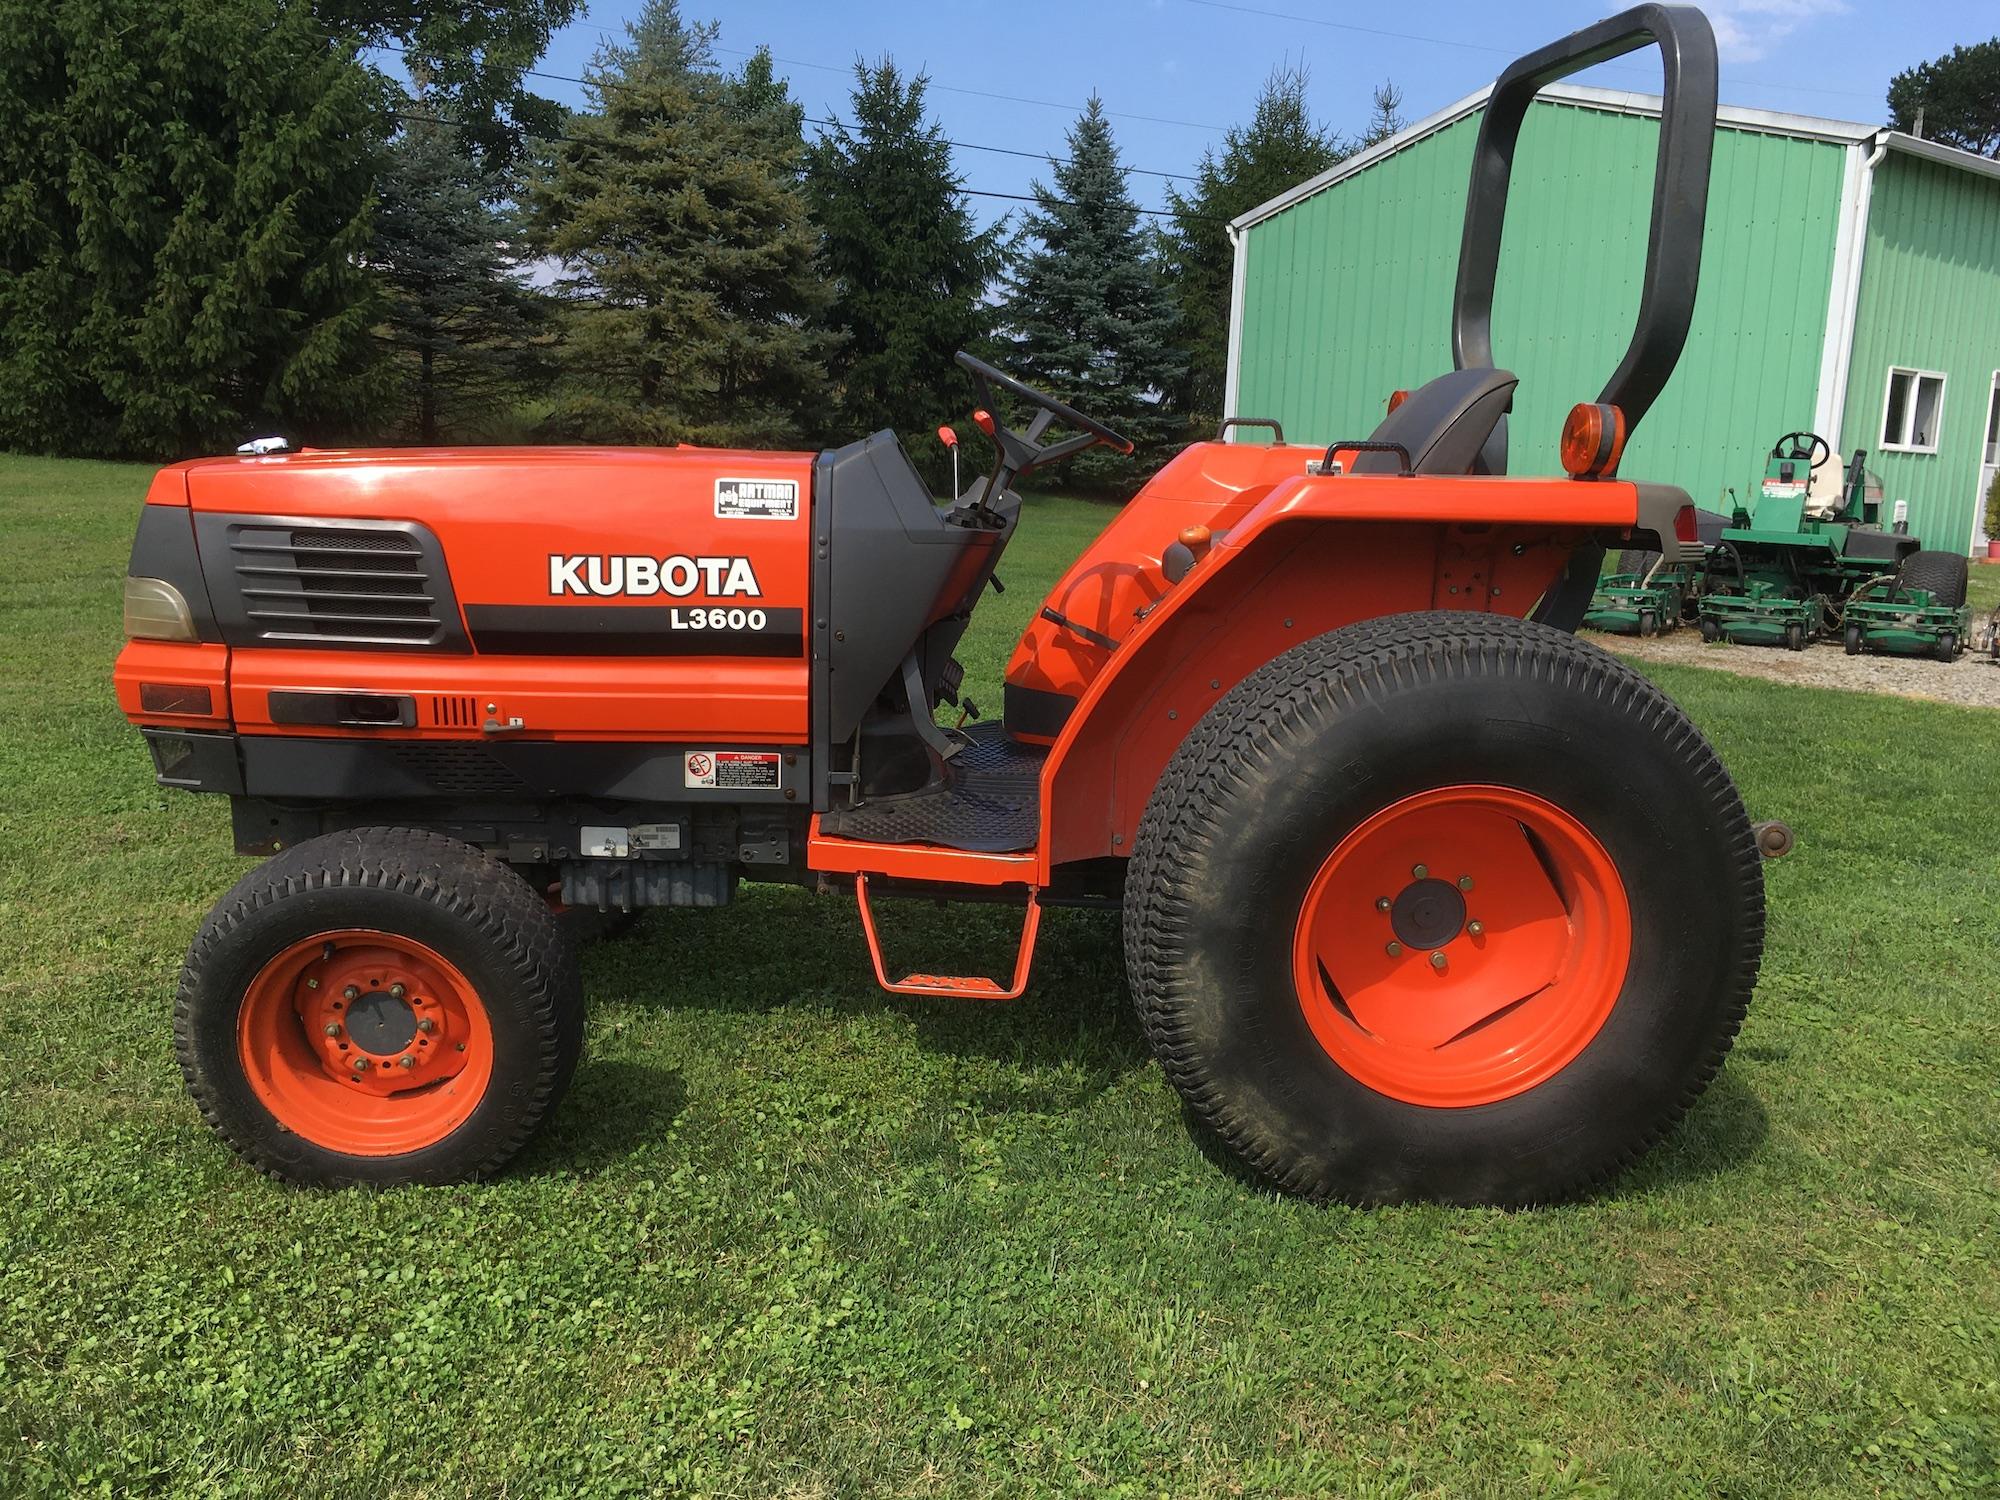 Kubota-L3600-Tractor-01